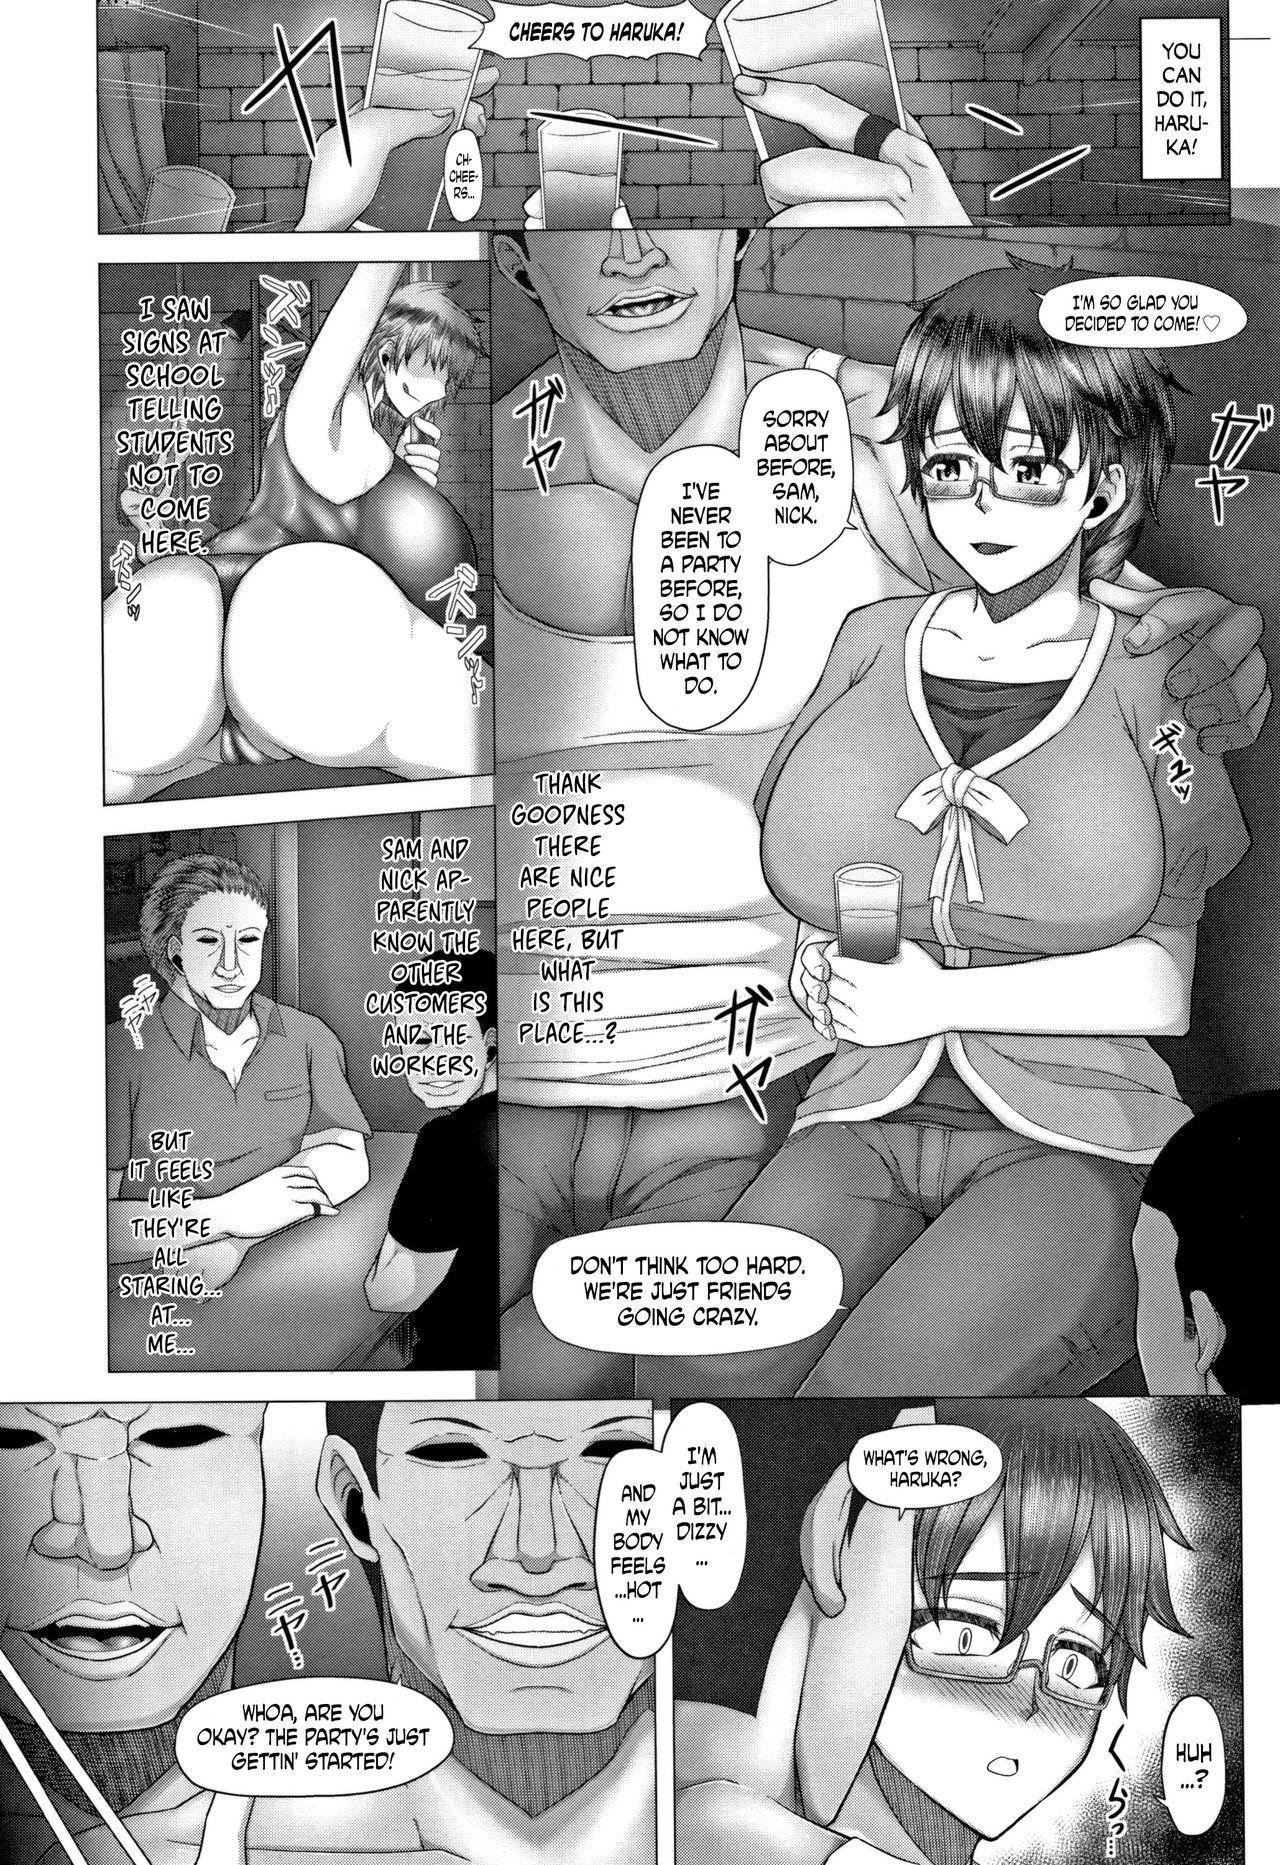 [Inoue Nanaki] Joushiki Daha! Kuro Gal Bitch-ka Seikatsu Ch. 1-3, 5-8 [English] [Dark Mac + N04h] 87